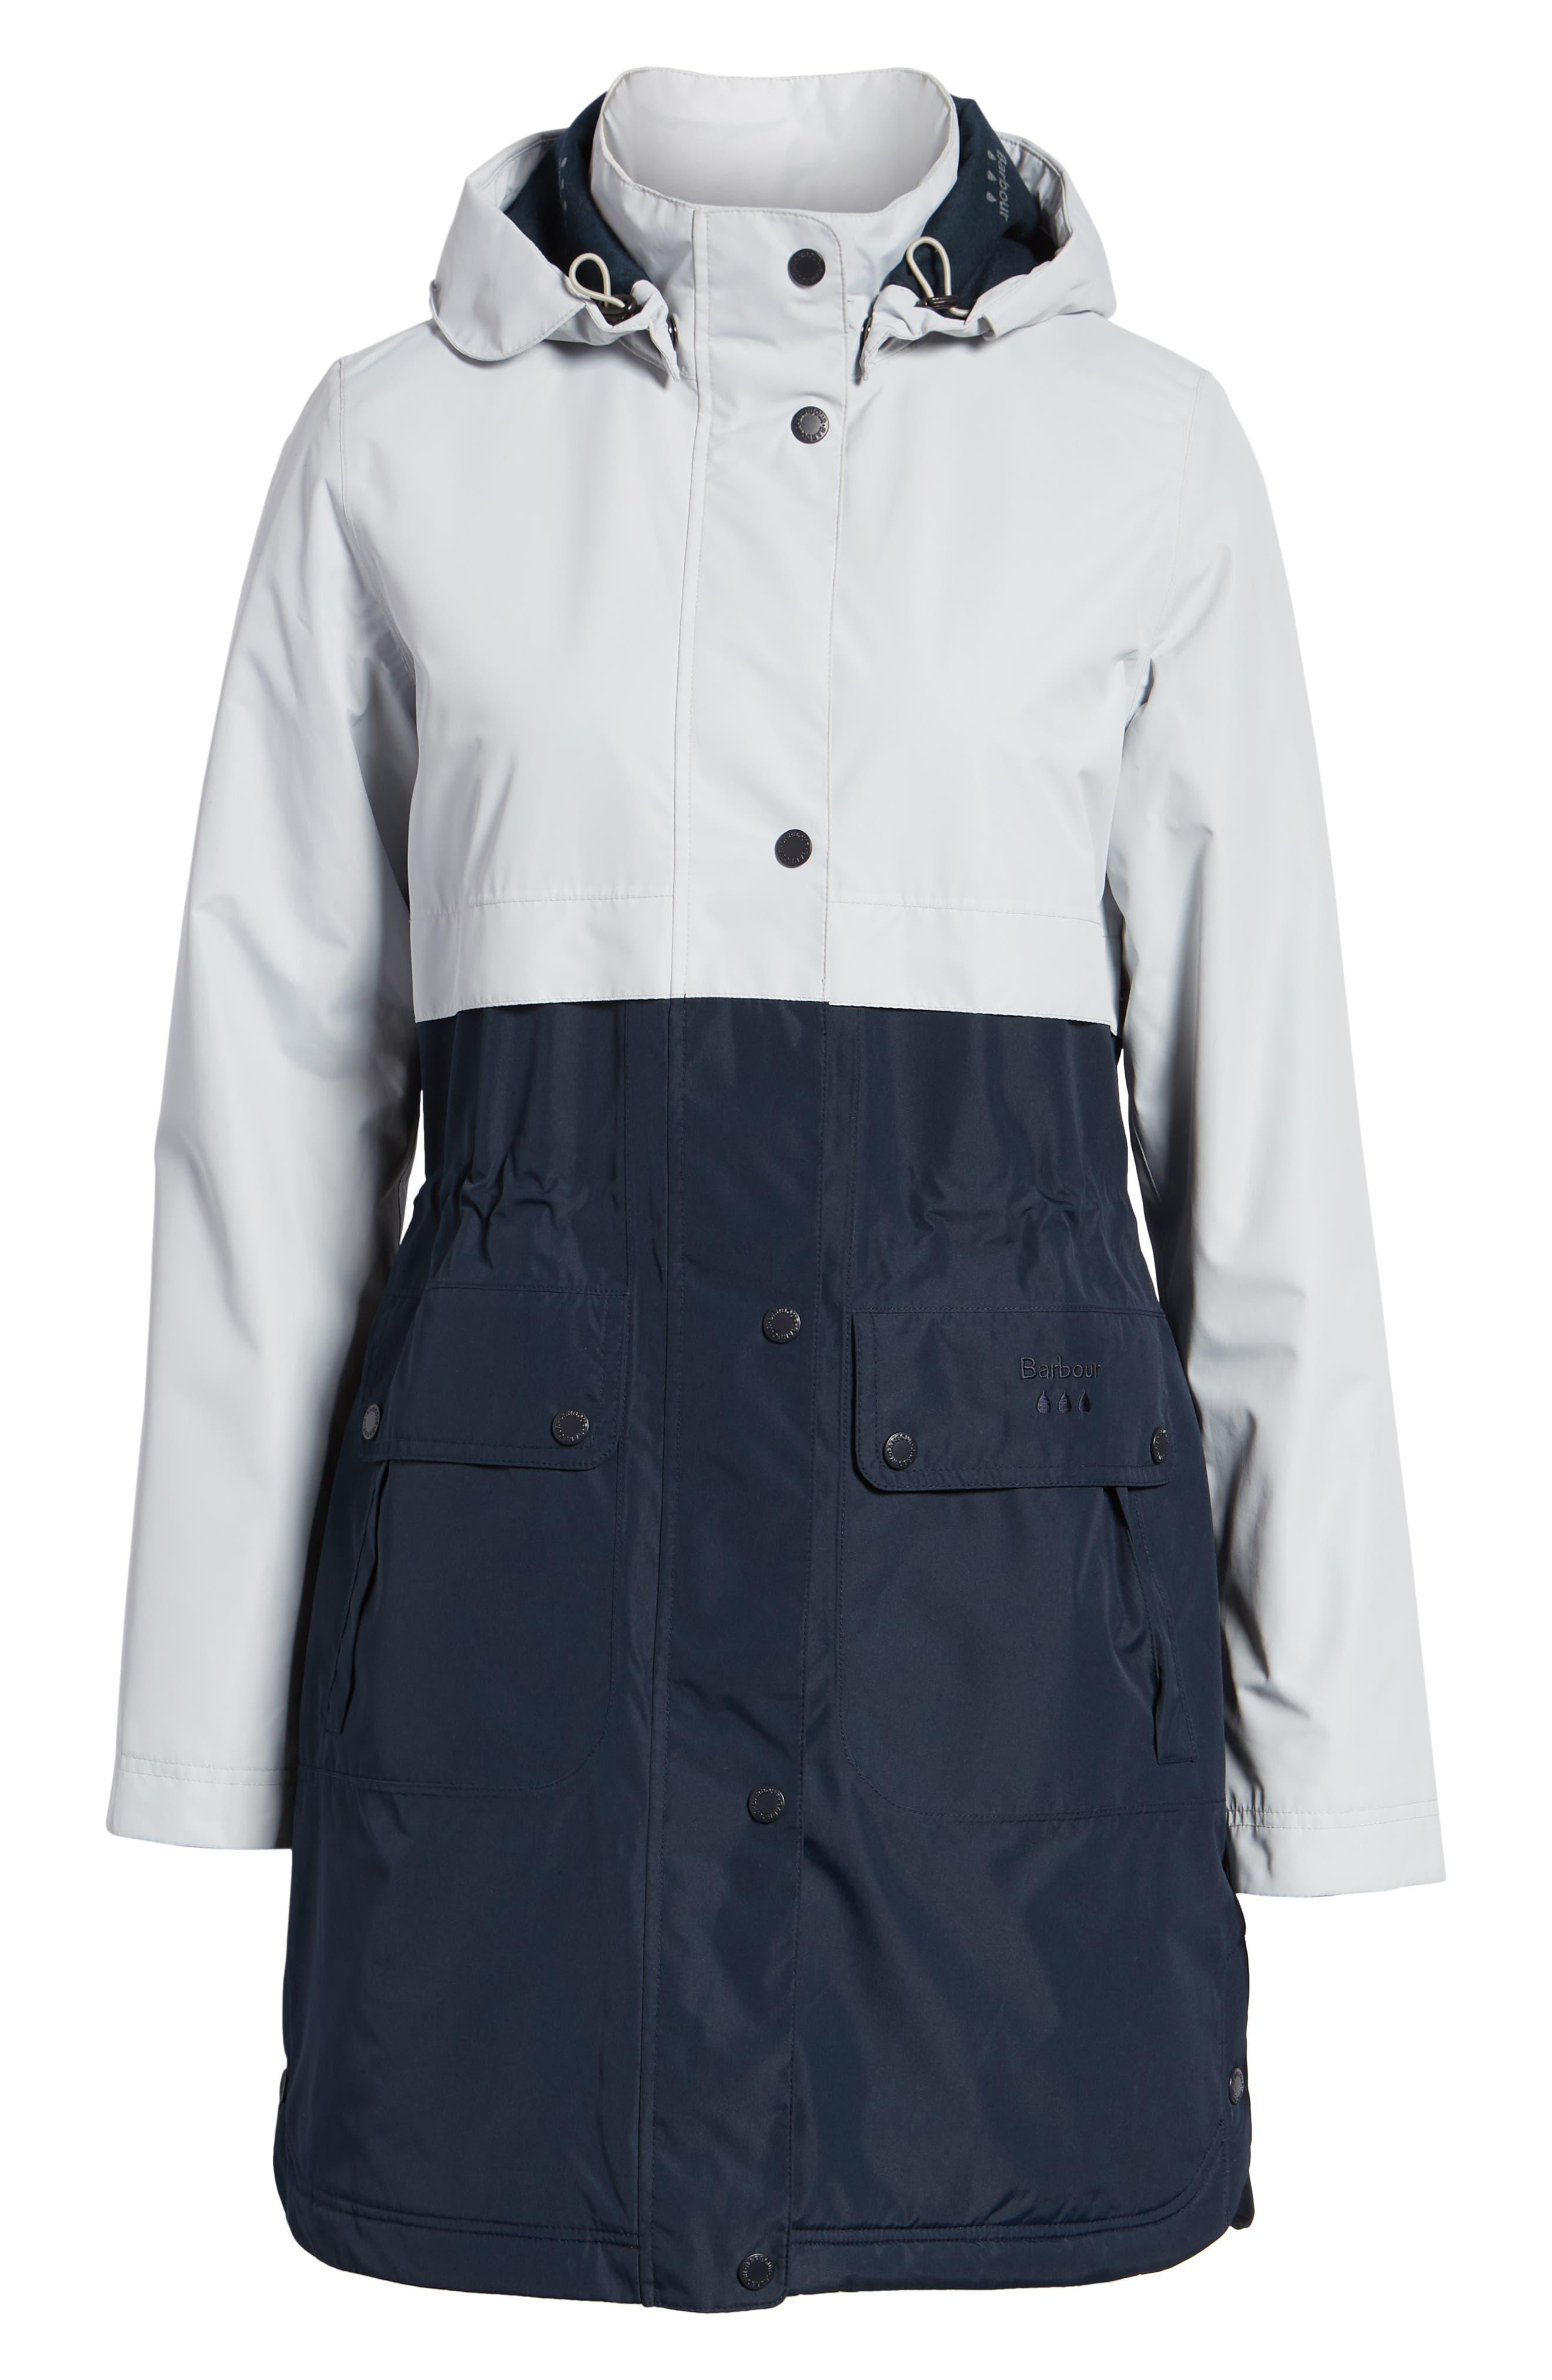 Damini Waterproof Jacket,                             Alternate thumbnail 6, color,                             410